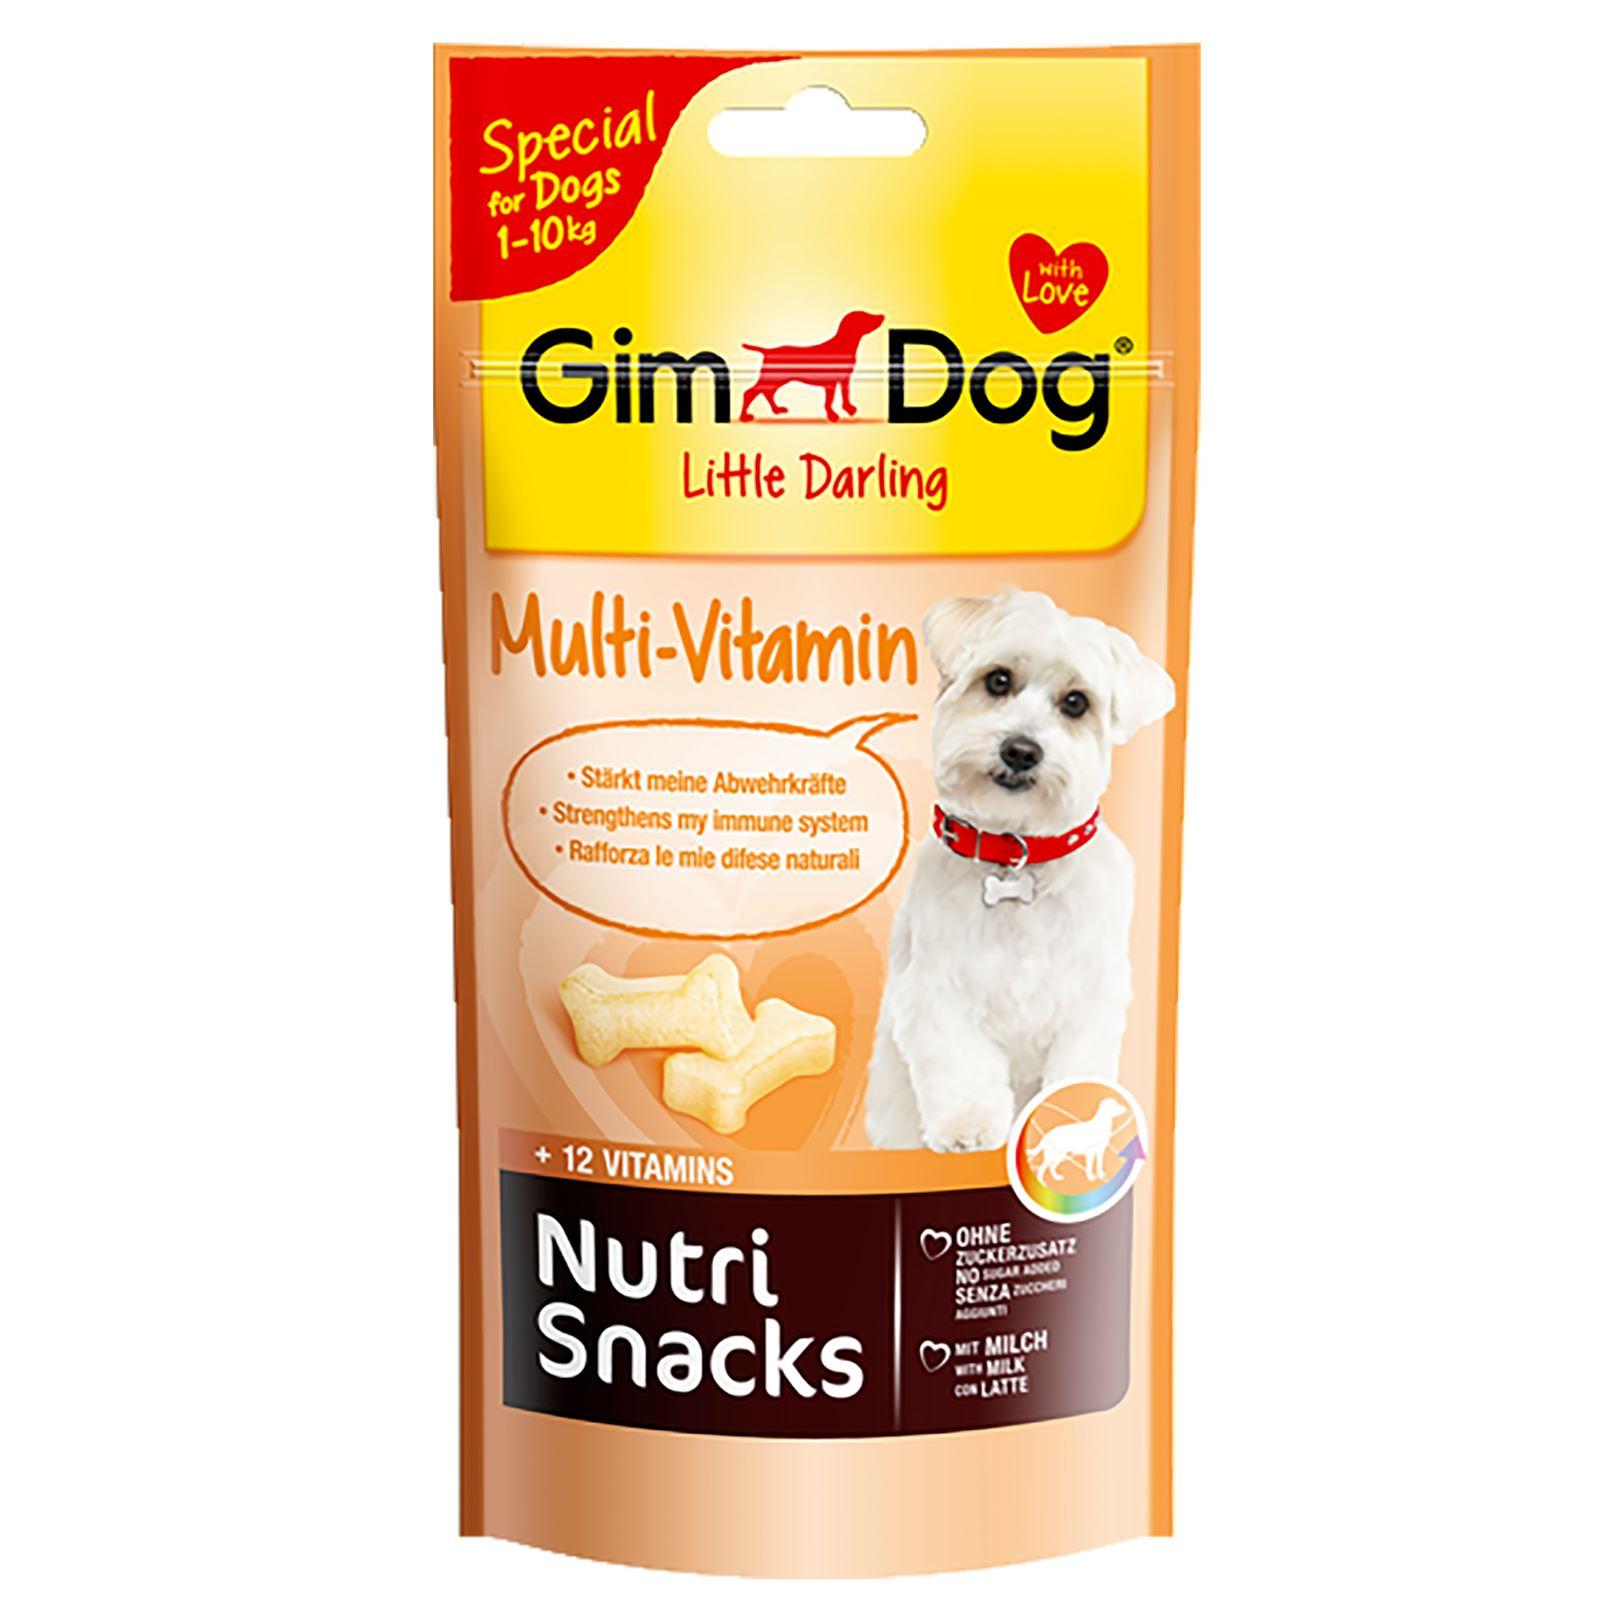 Косточки для собак весом до 10 кг. Мульти-Витамин Gimdog Nutri Snacks Multi-vitamin для иммунитета